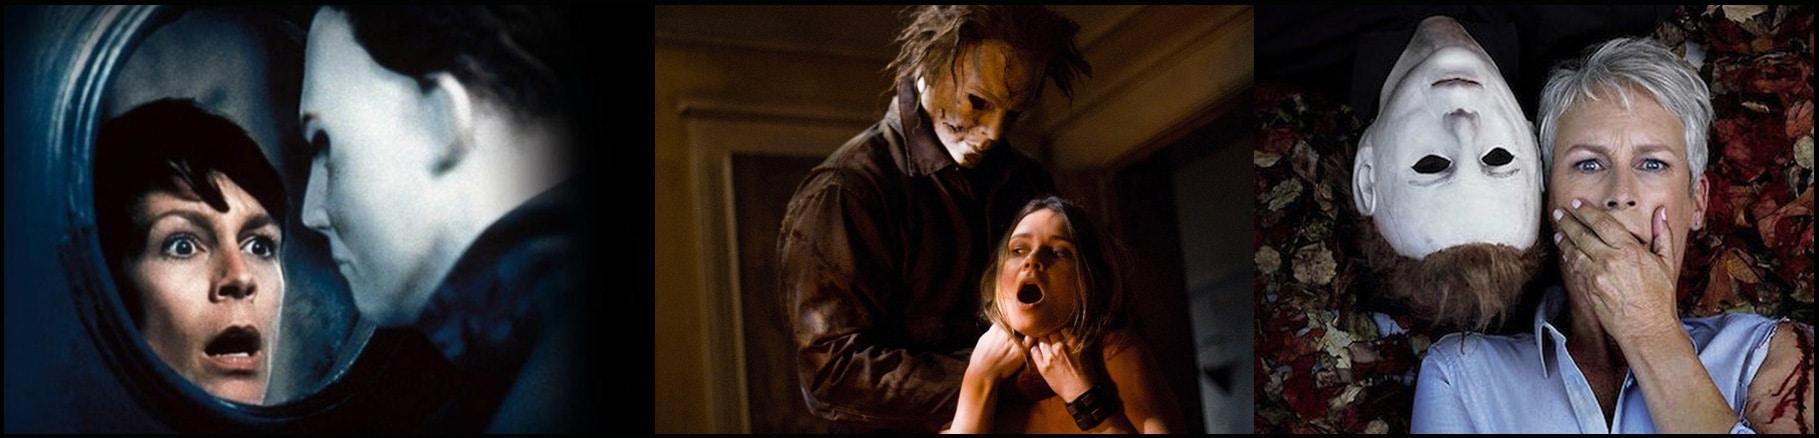 Halloween Film Franchise